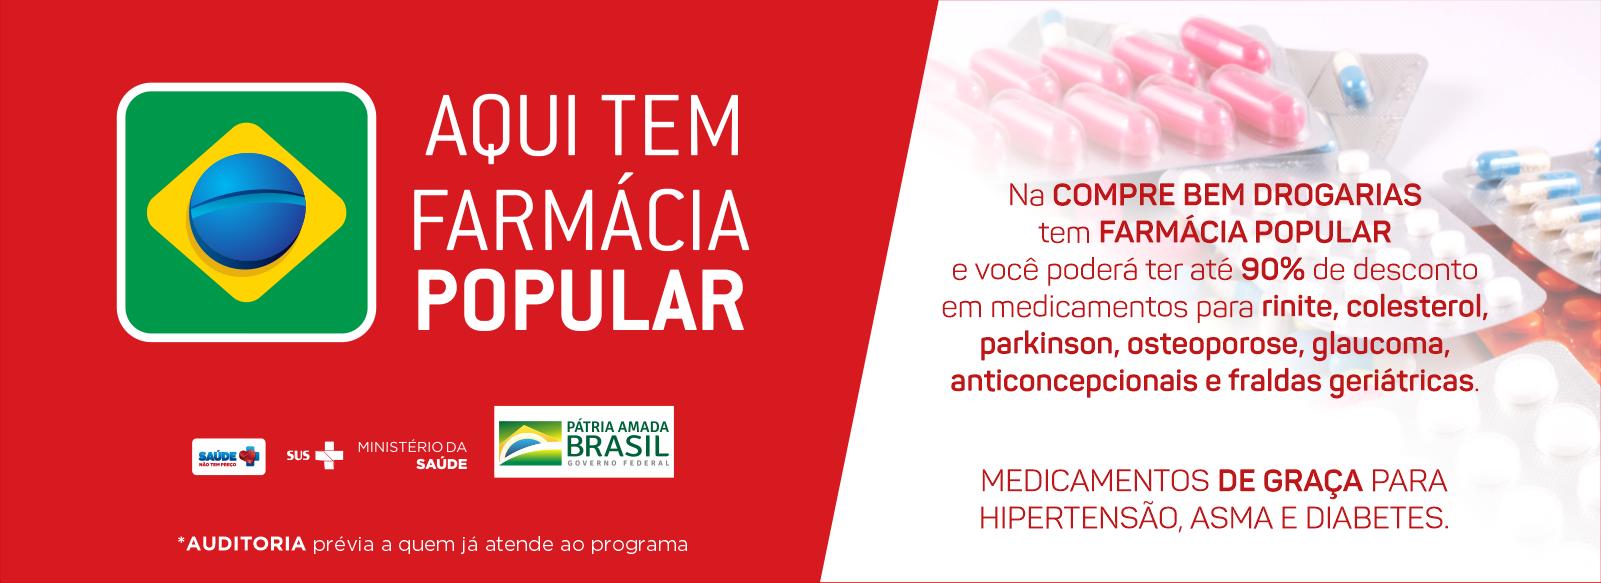 08 - Farmácia Popular